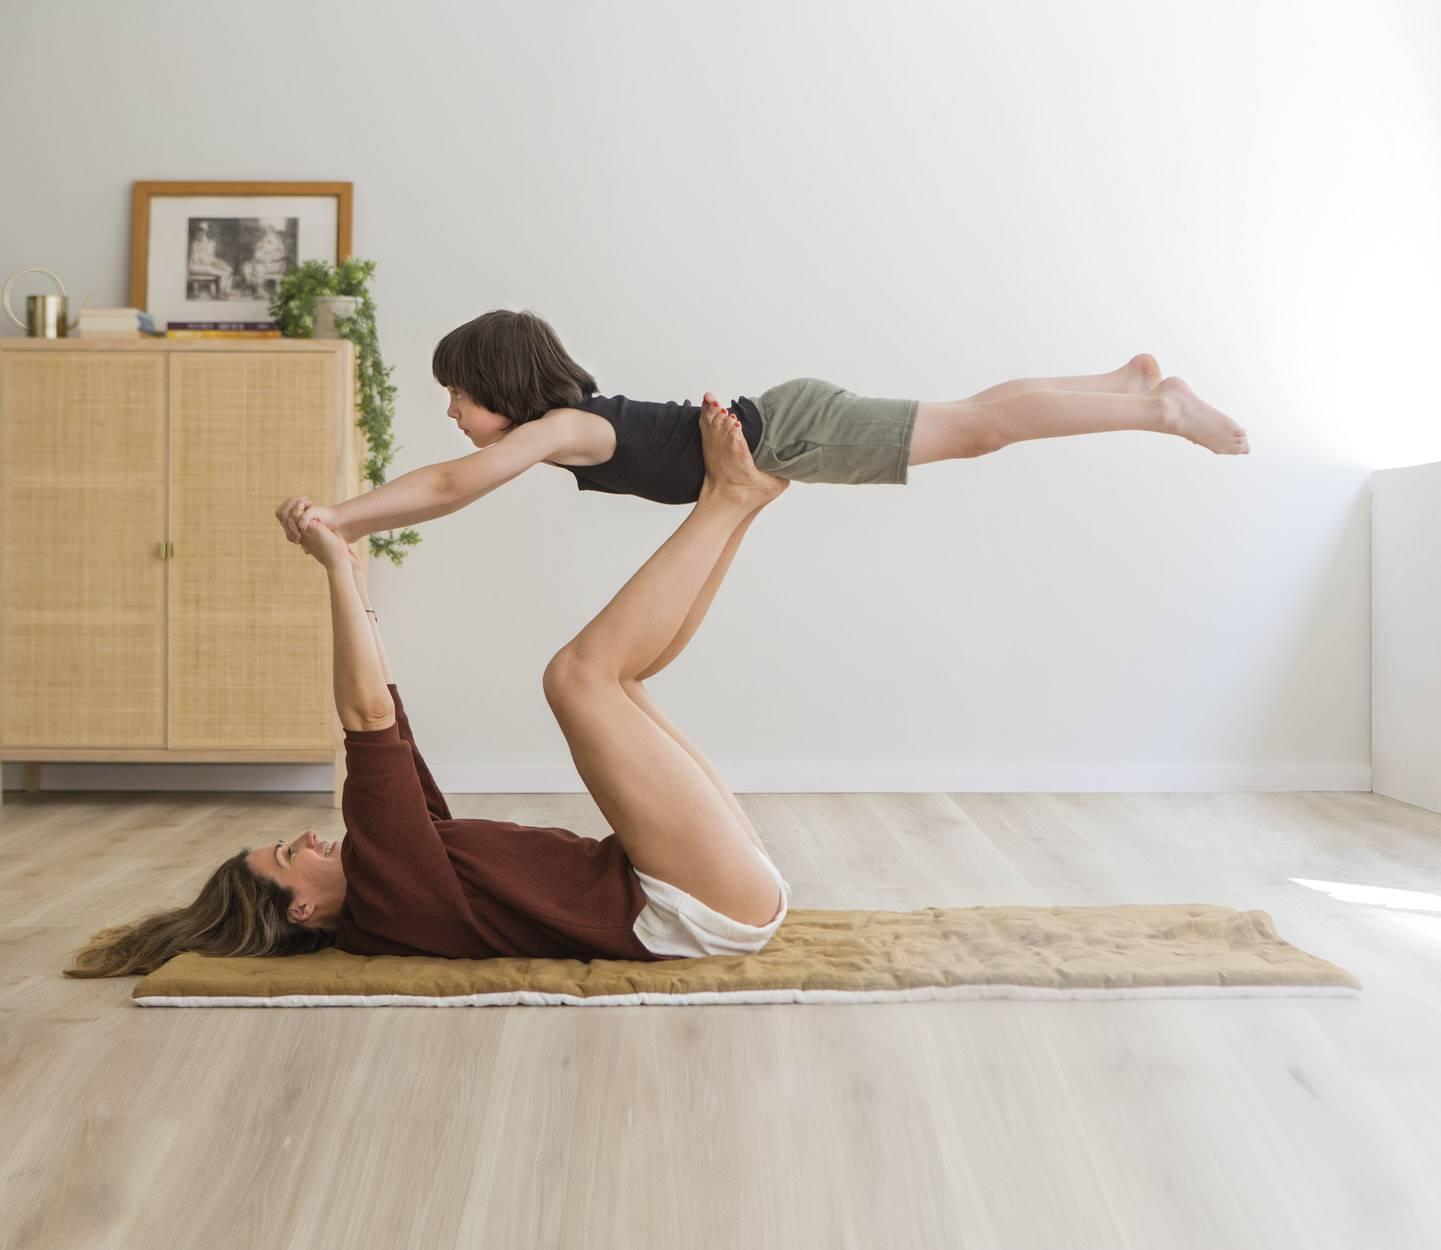 Yoga exercises with kids, yoga poses